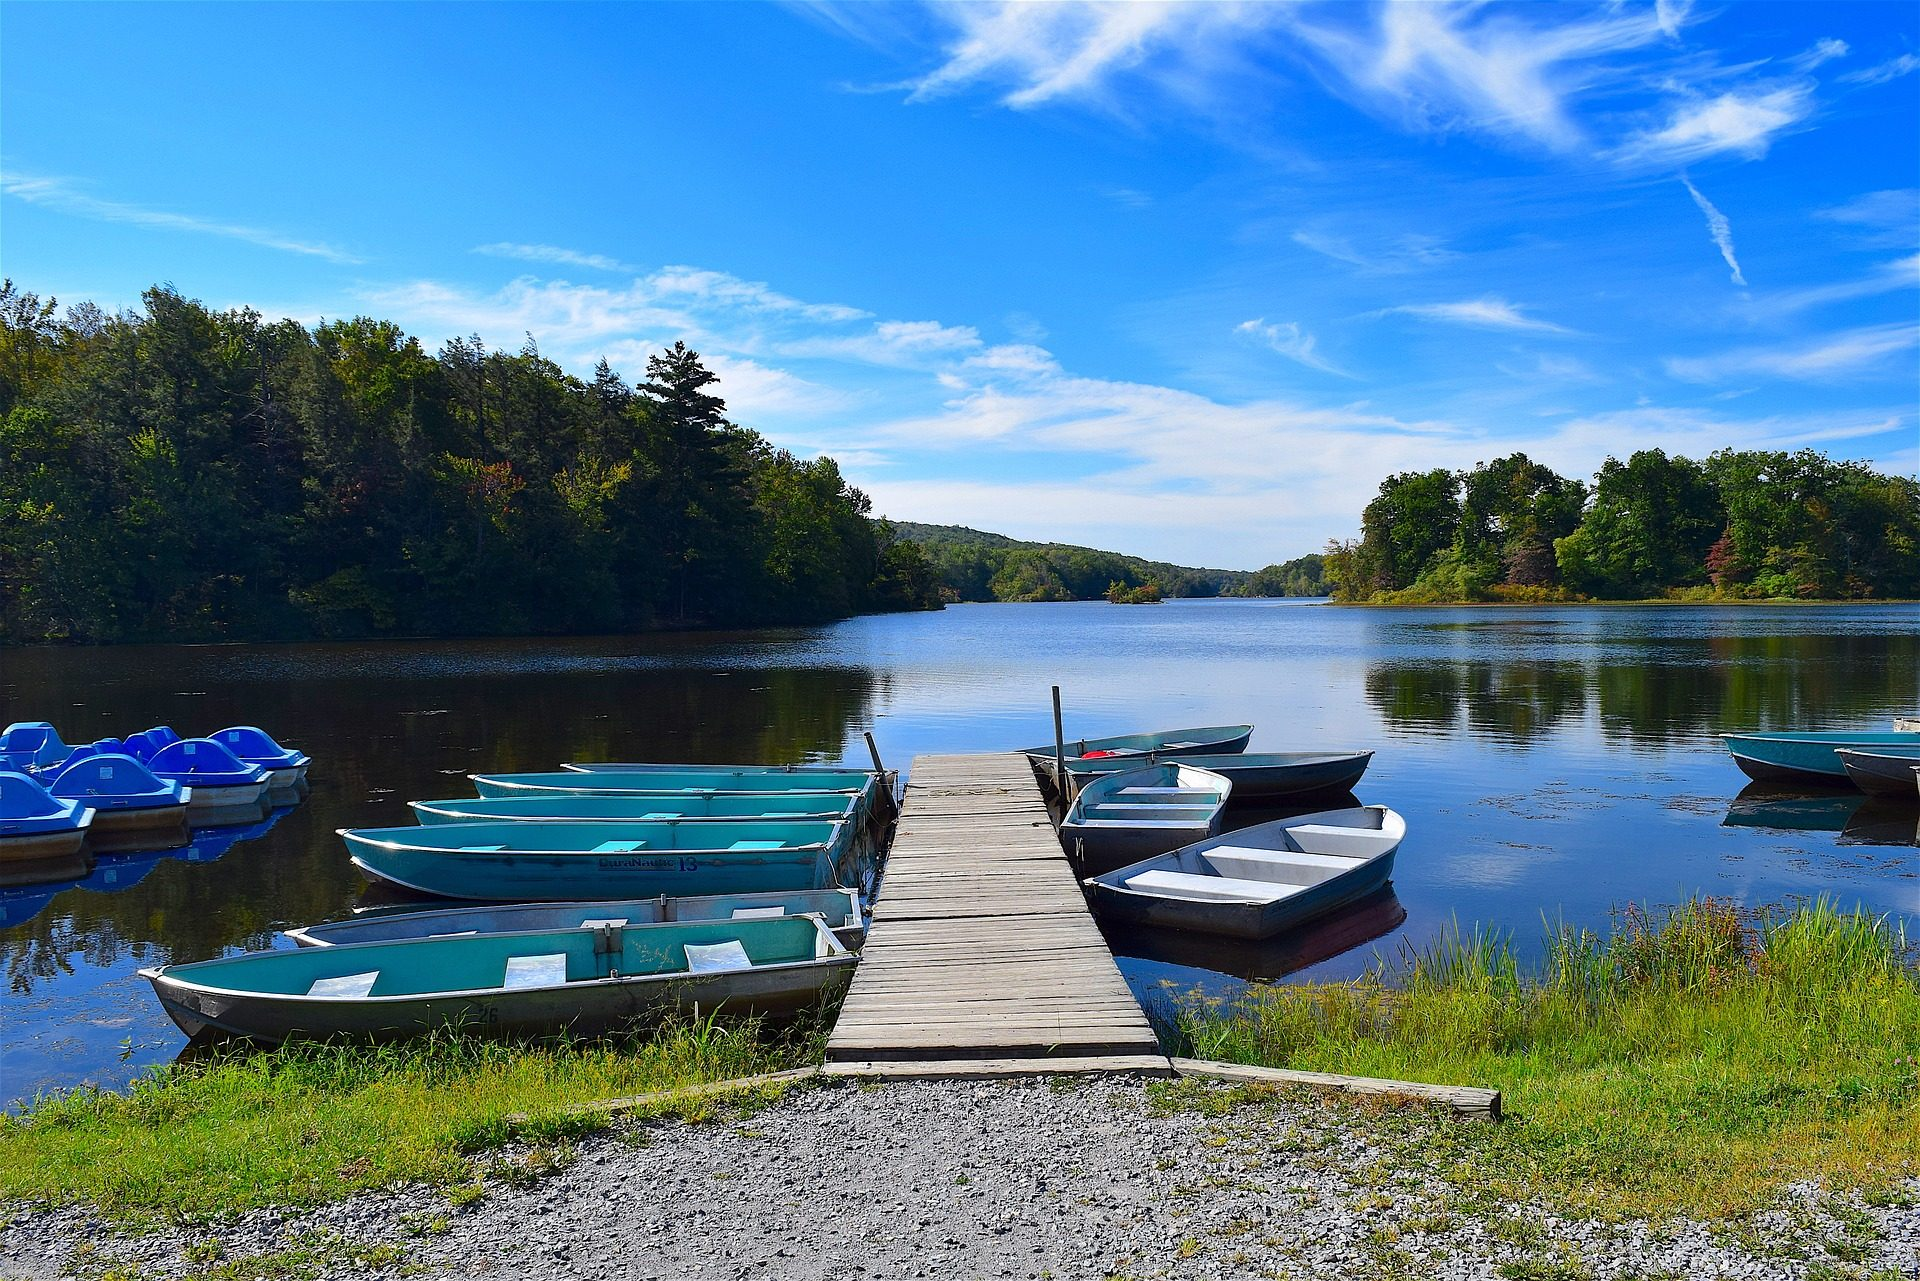 Embarcadero, Barcos, Lago, árvores, reflexões - Papéis de parede HD - Professor-falken.com